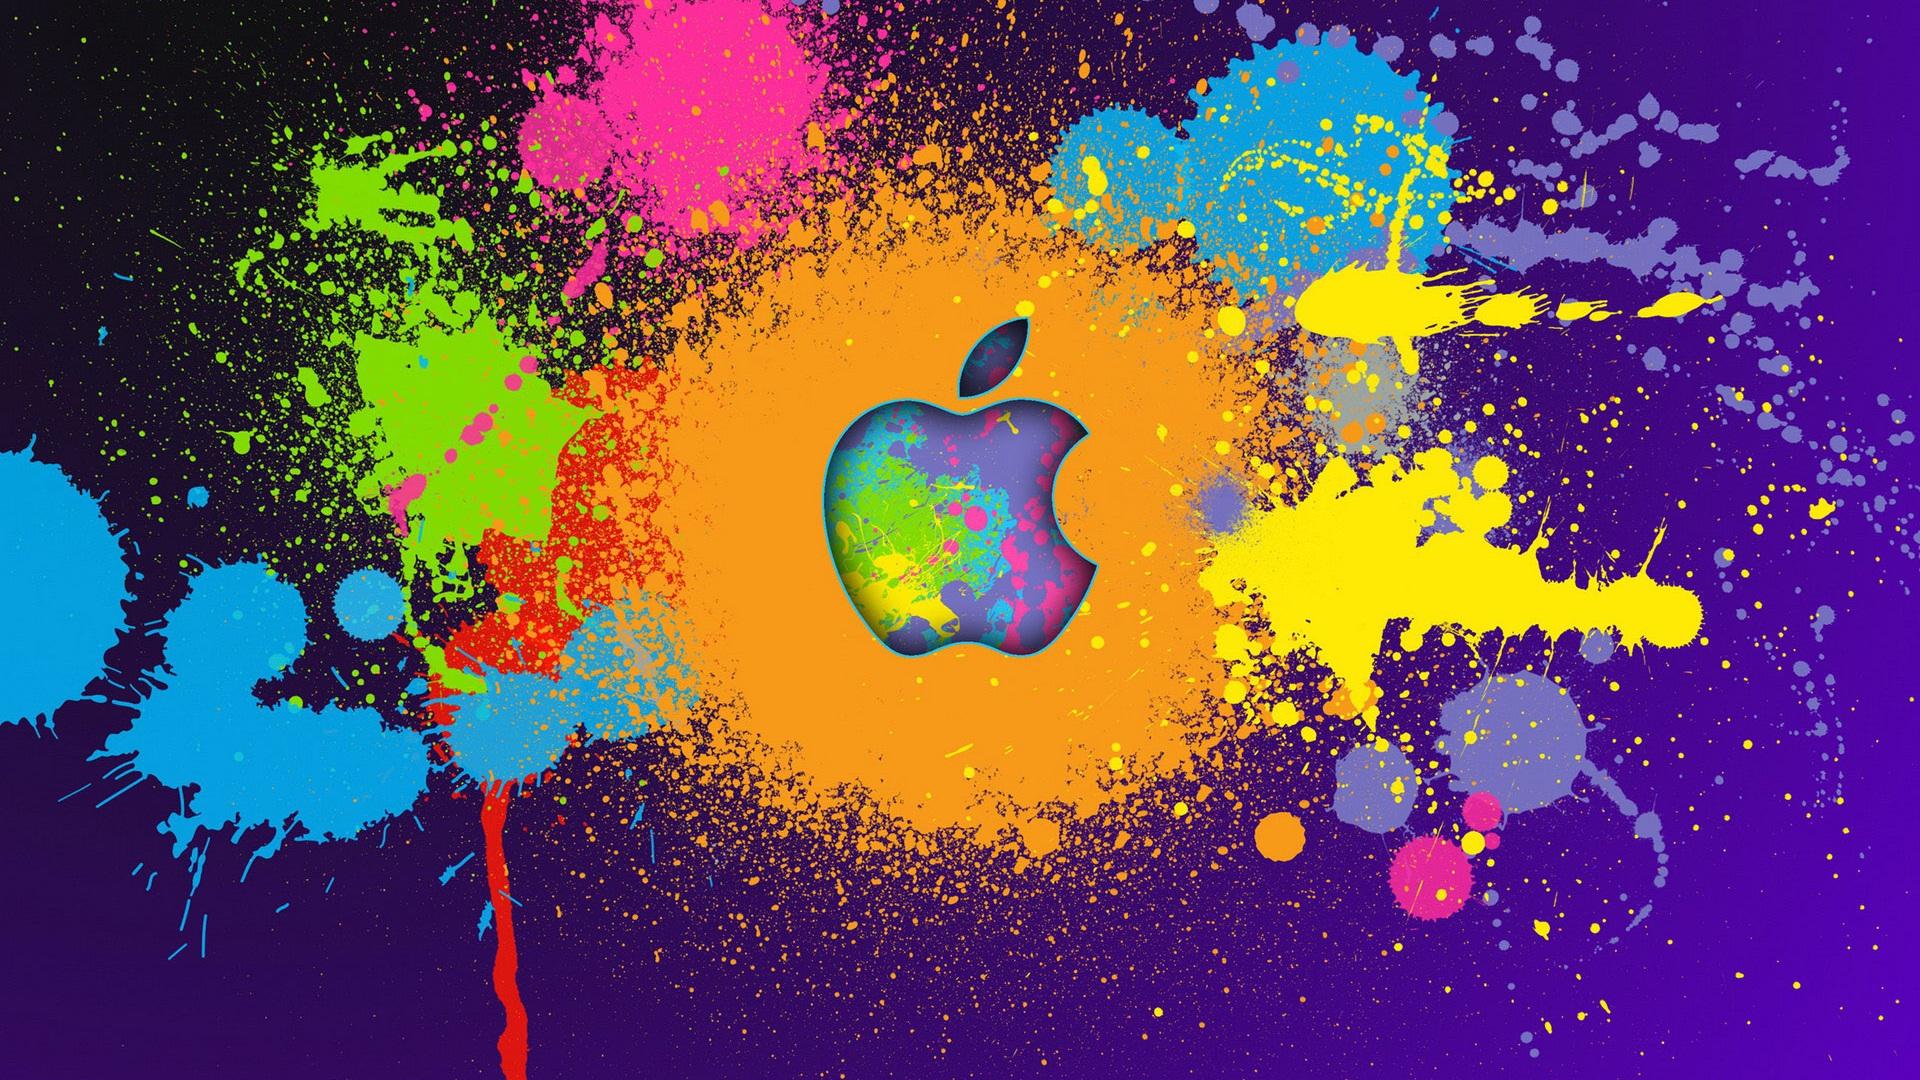 Fondos De Pantalla Apple Pintura Colorida 1920x1200 Hd Imagen